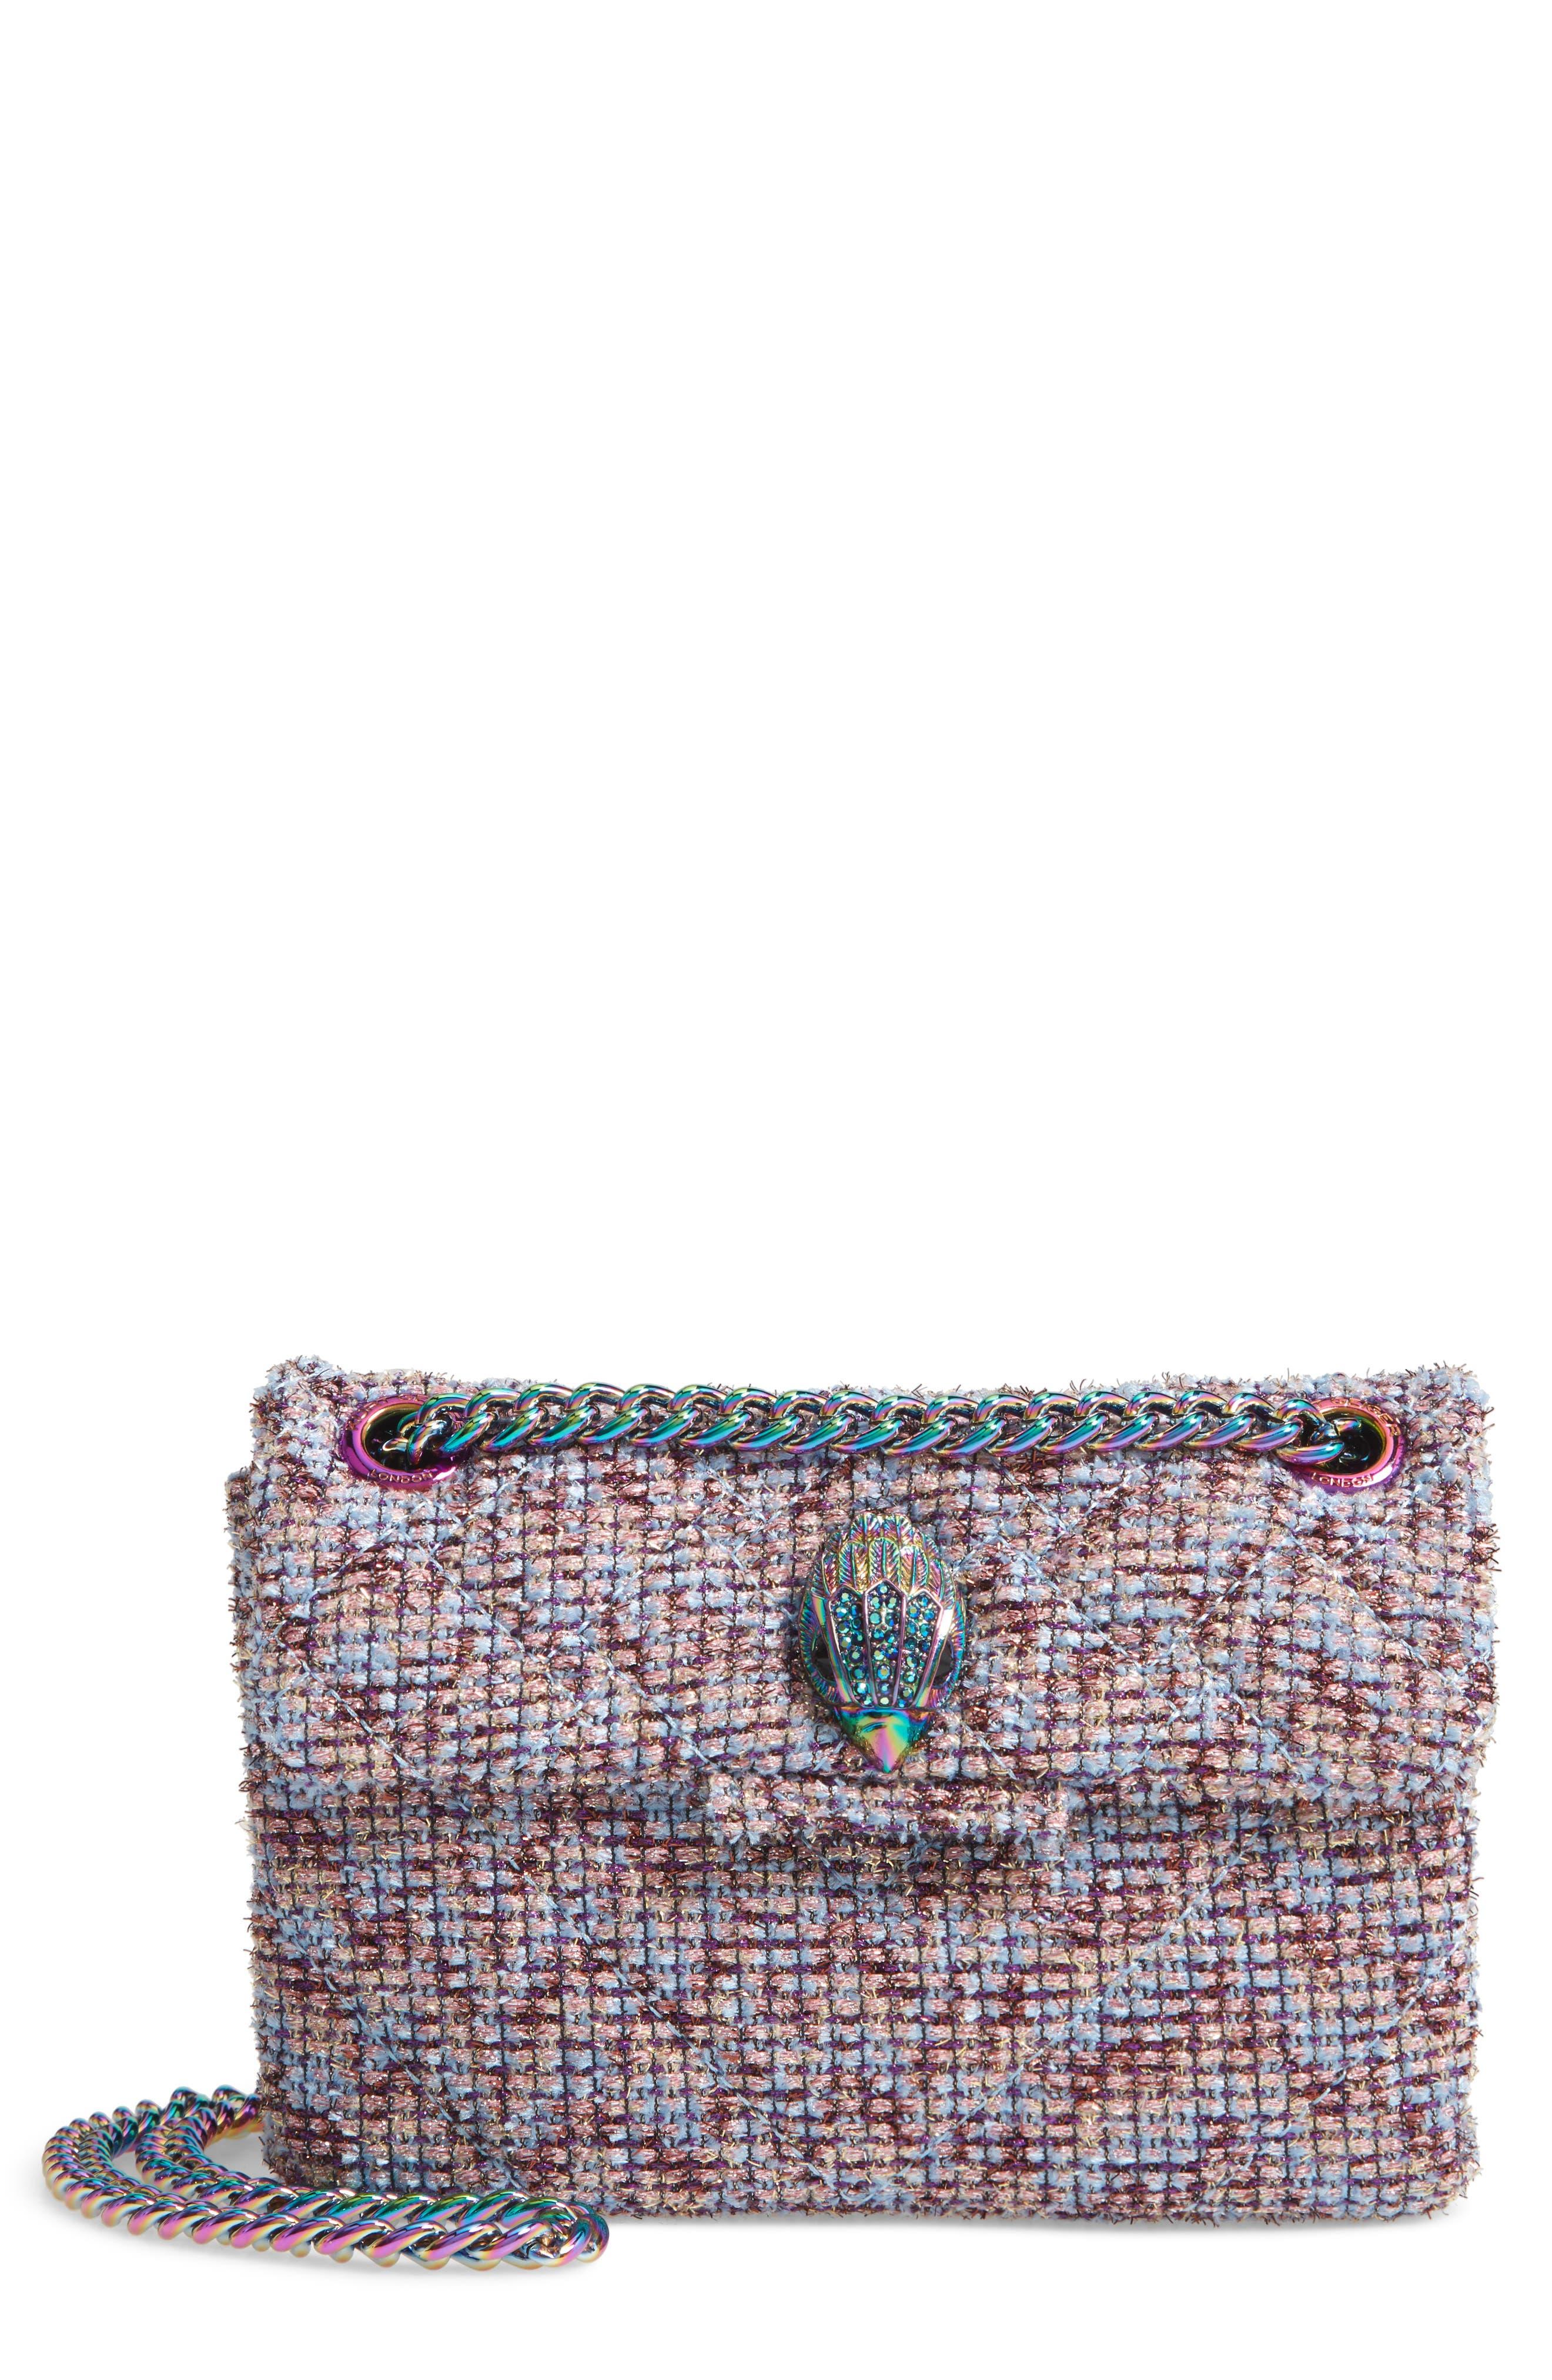 Mini Kensington Tweed Crossbody Bag,                             Main thumbnail 1, color,                             PINK